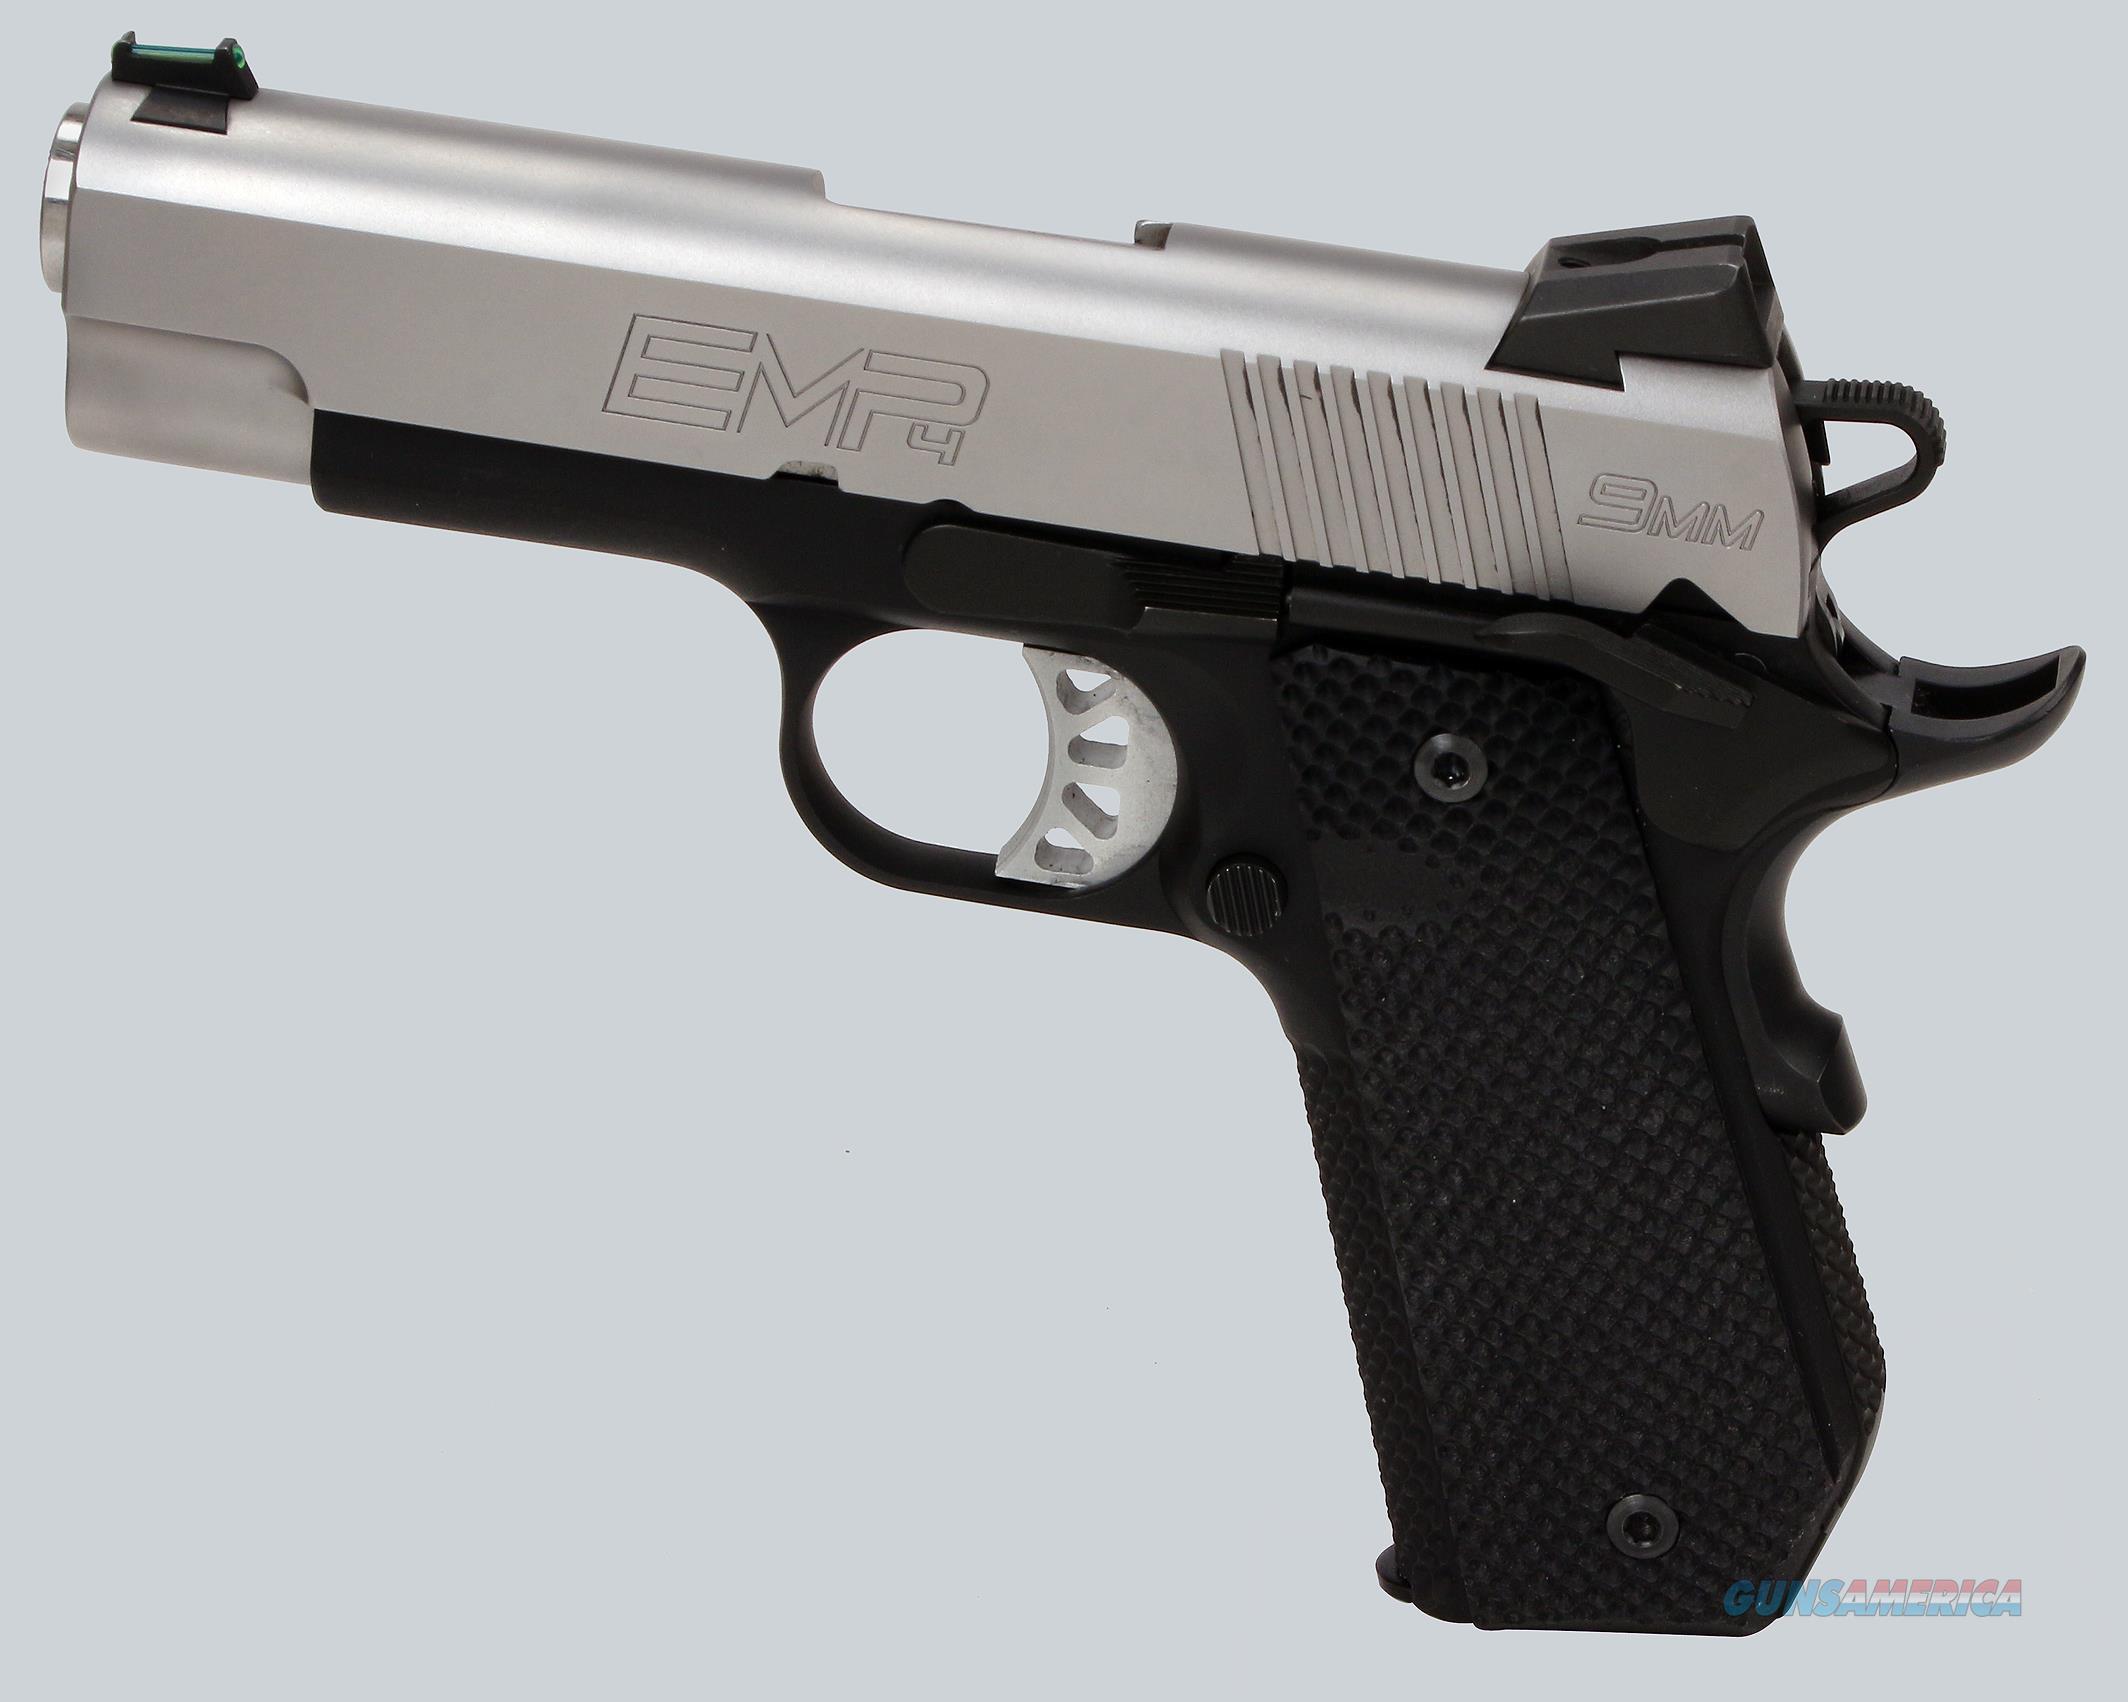 Springfield Armory 9mm EMP 4 Pistol  Guns > Pistols > Springfield Armory Pistols > 1911 Type